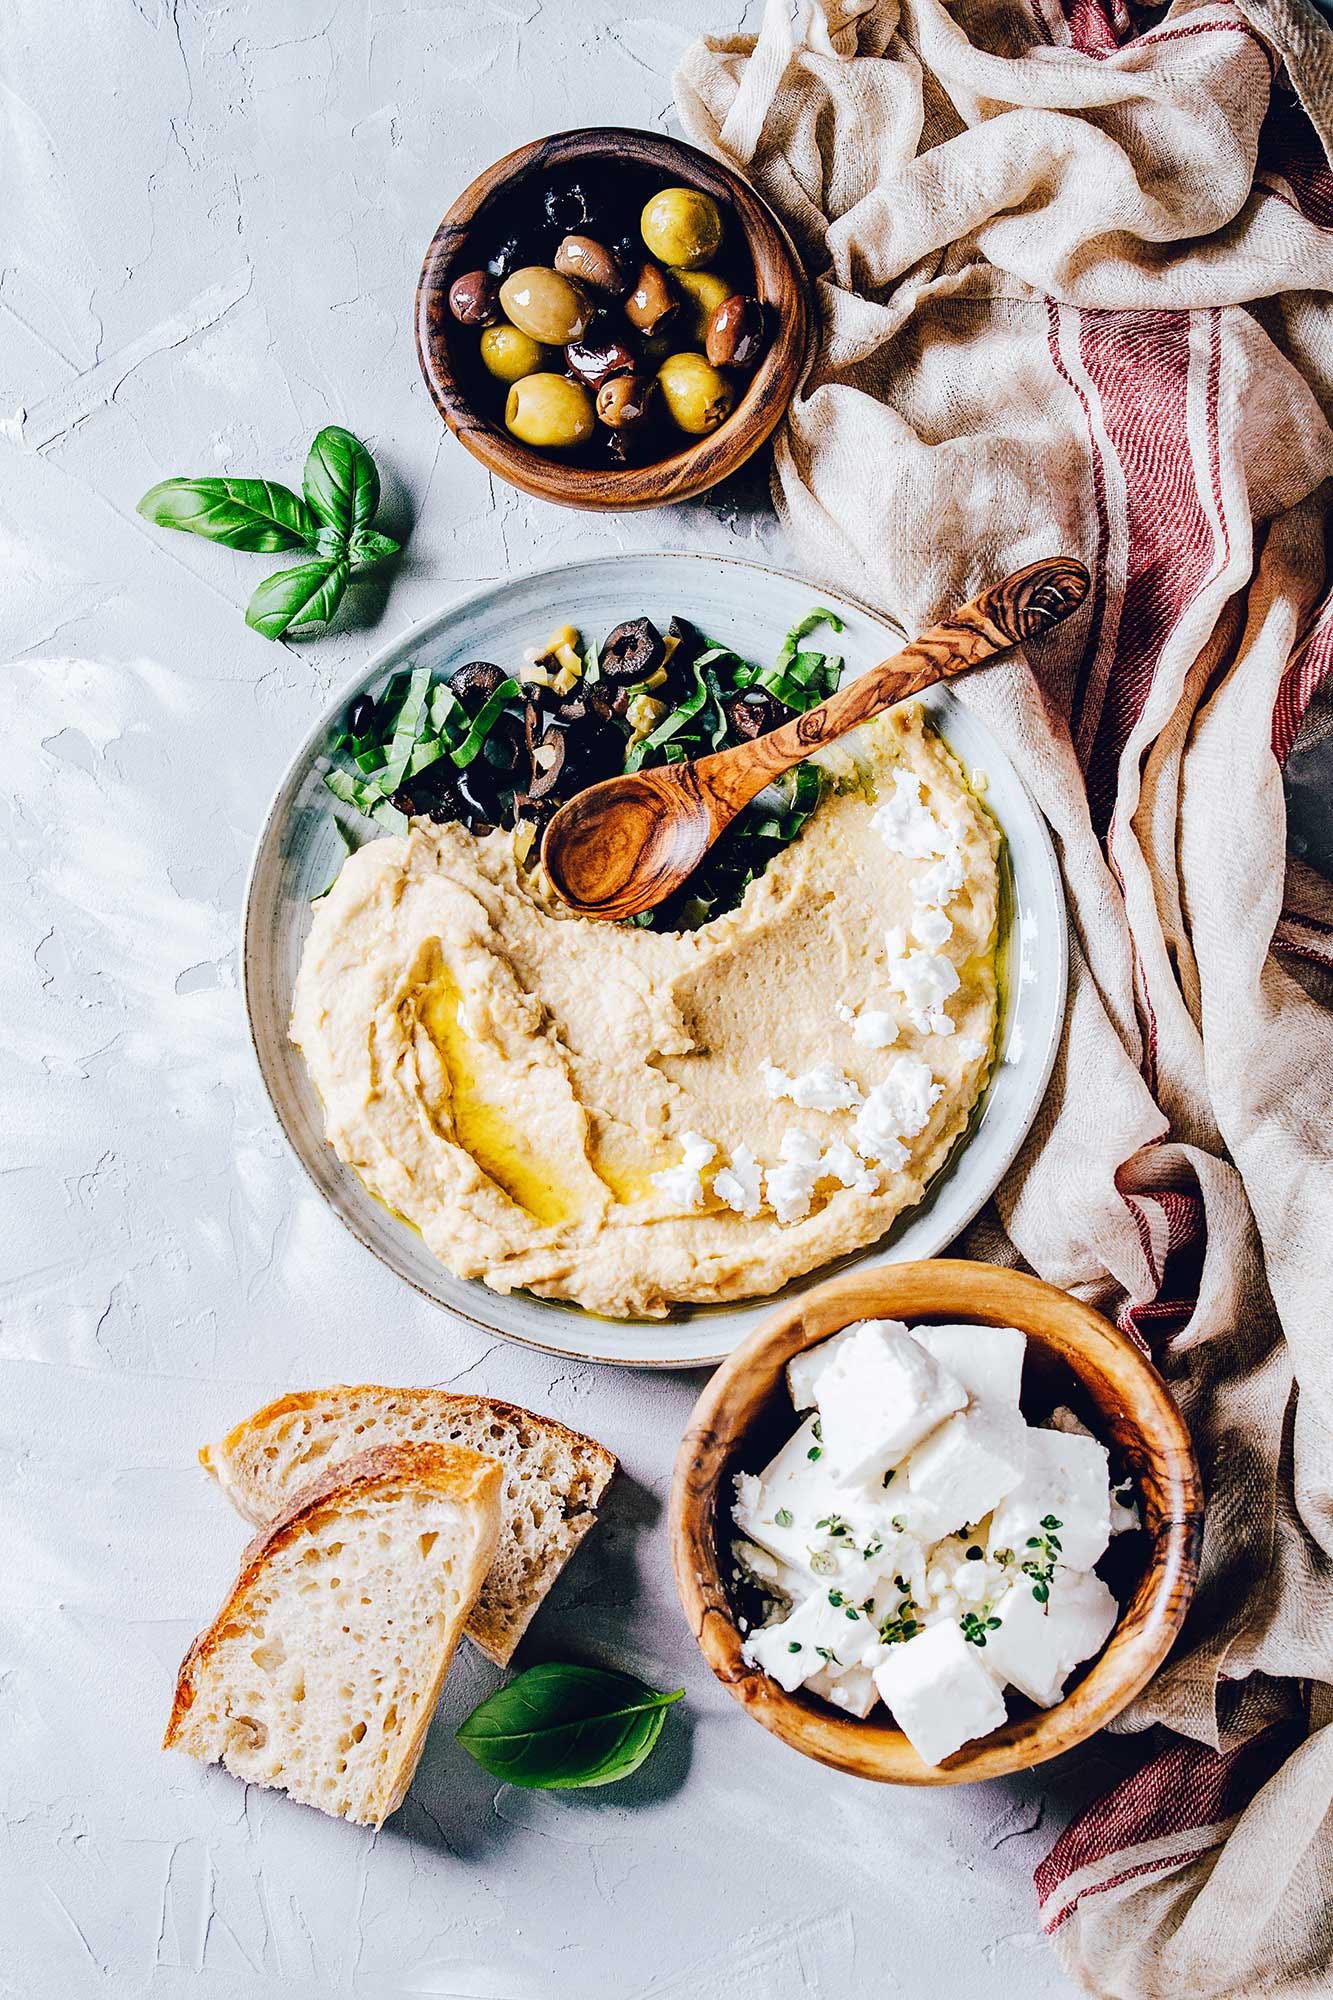 White Bean and Chickpea Hummus